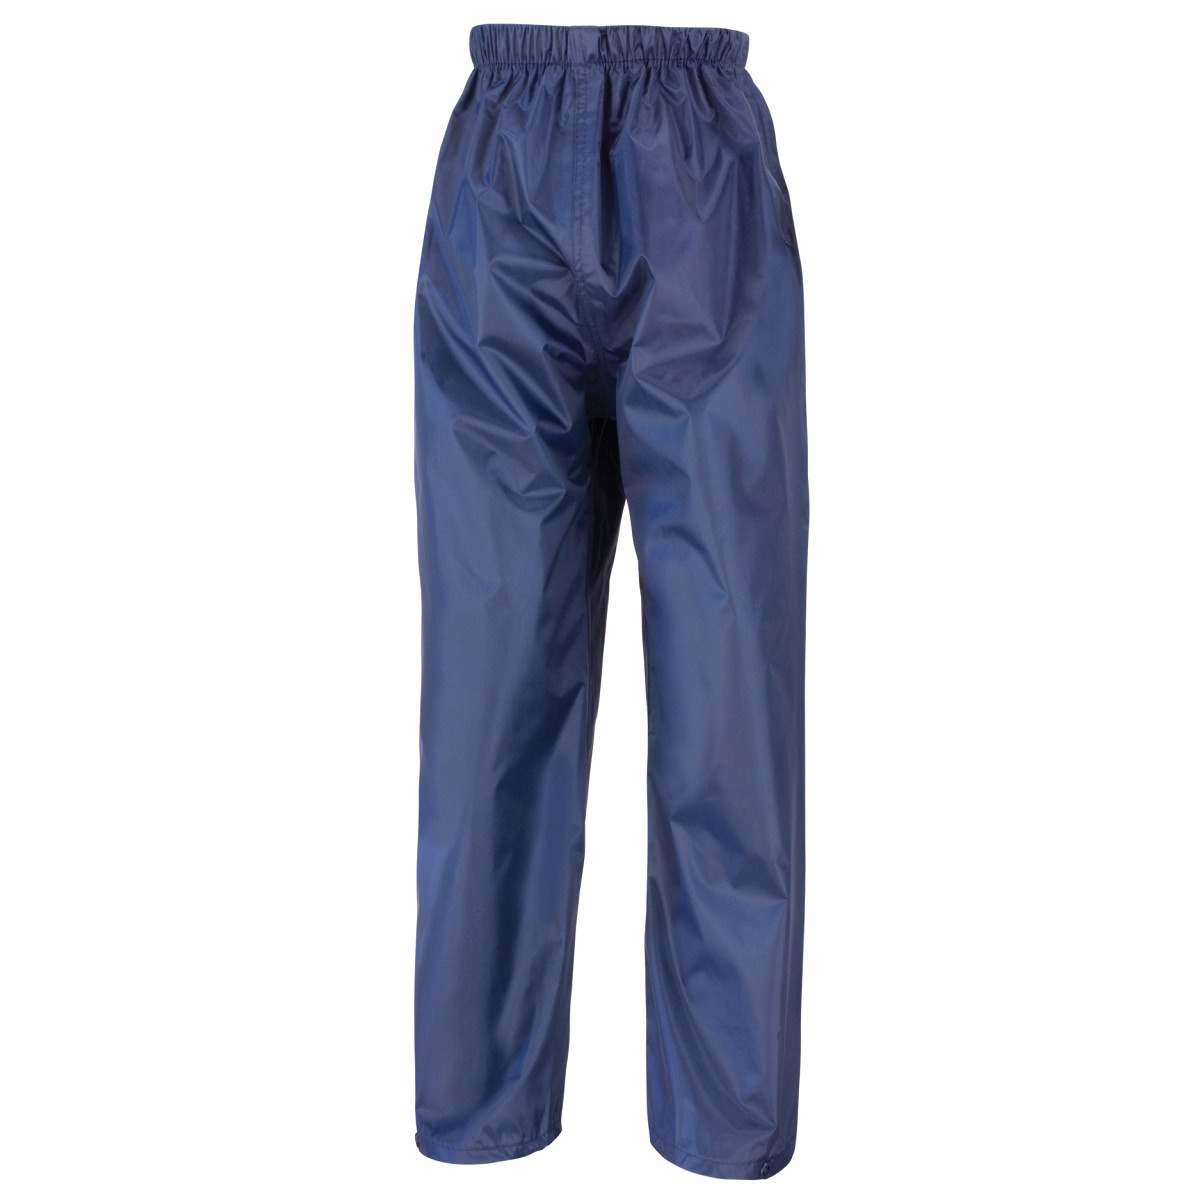 Result Mens Core Stormdri Rain Over Trousers / Pants (XL) (Navy Blue)